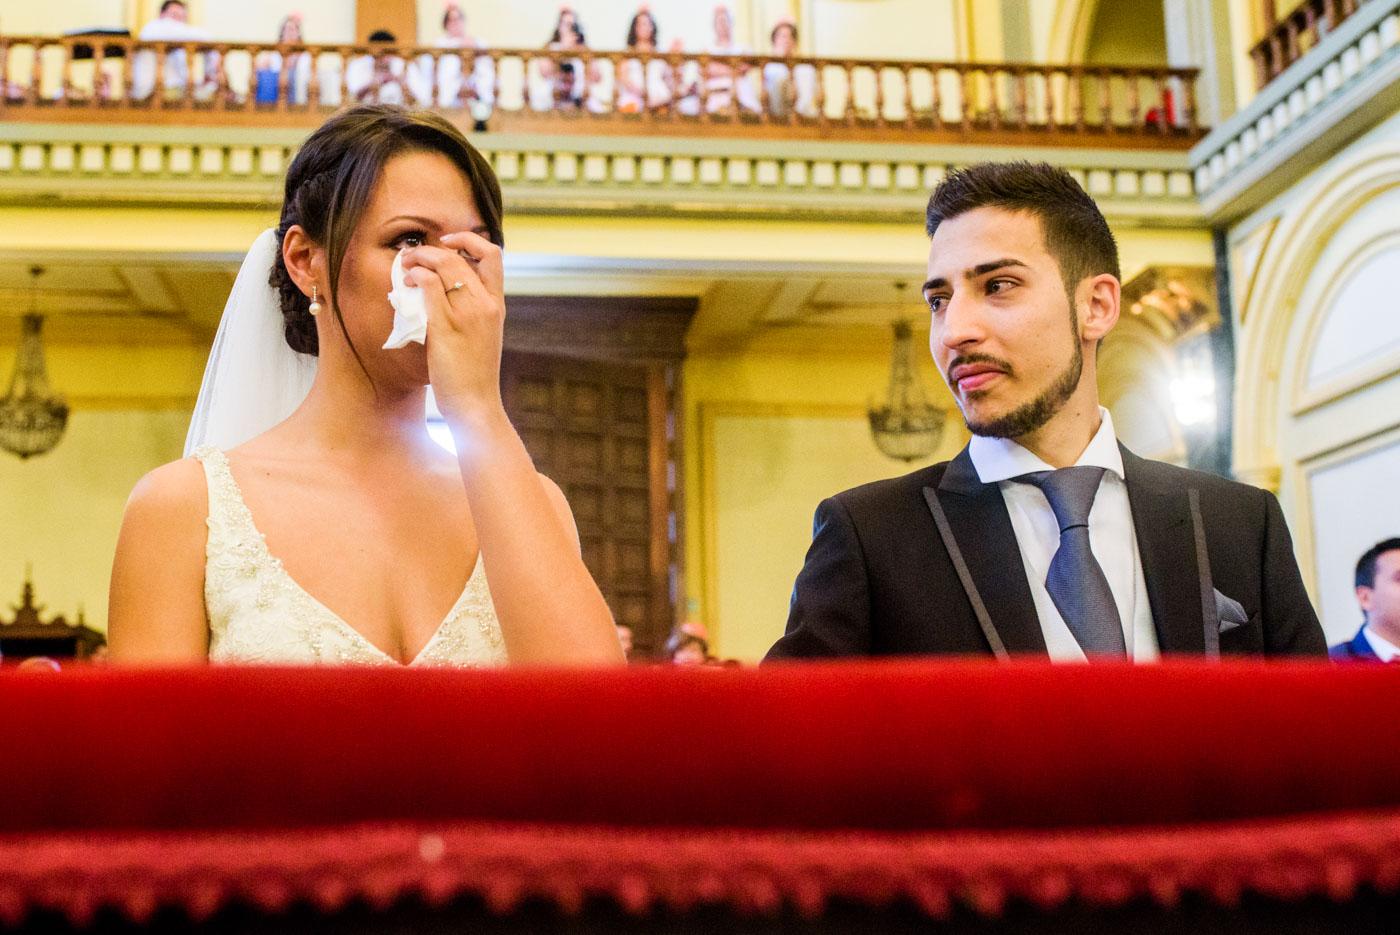 Fotos-boda-emotiva-pedro-abad-cordoba